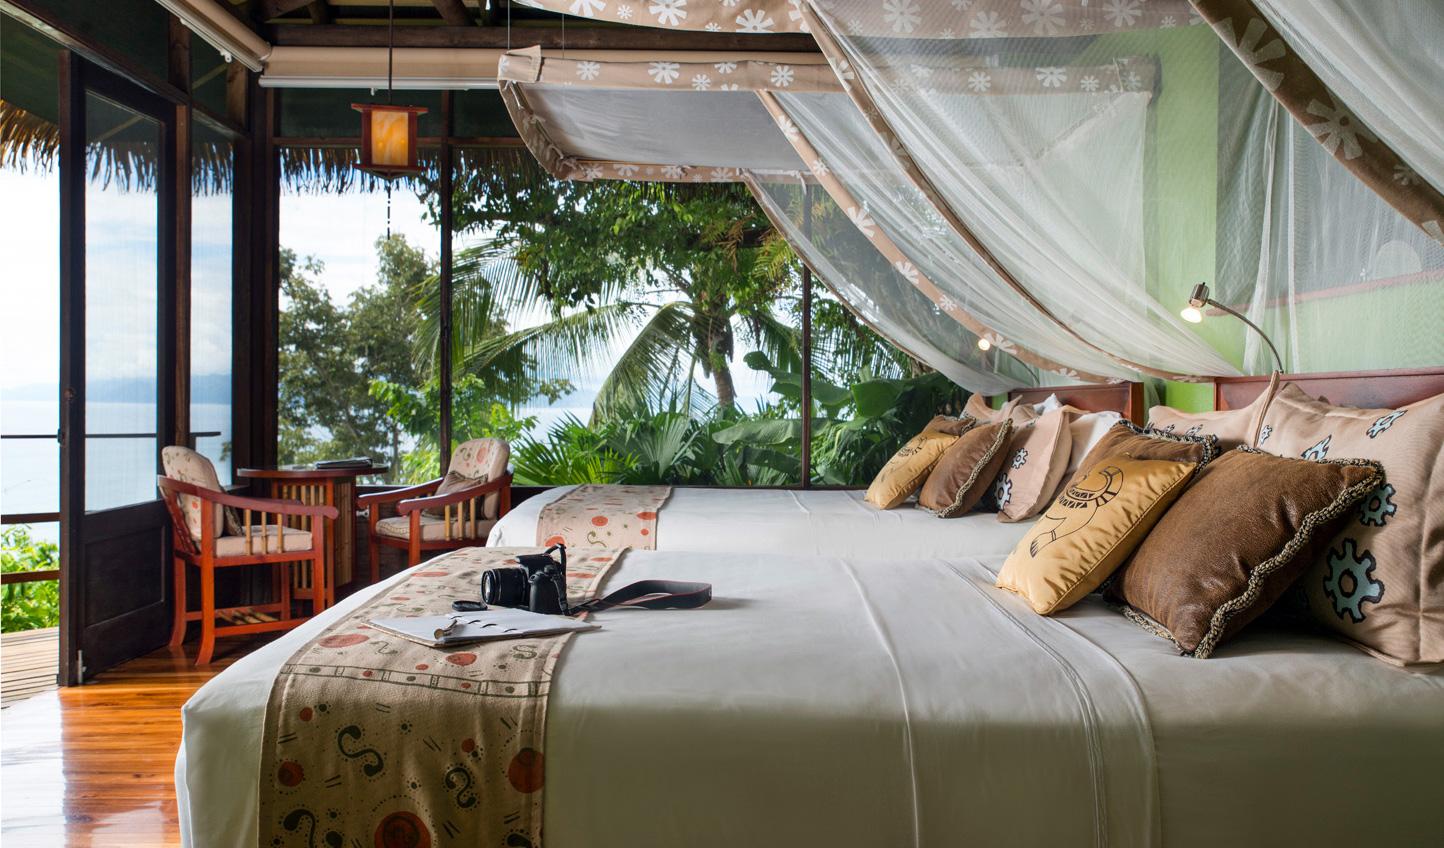 Wake up to a natural paradise